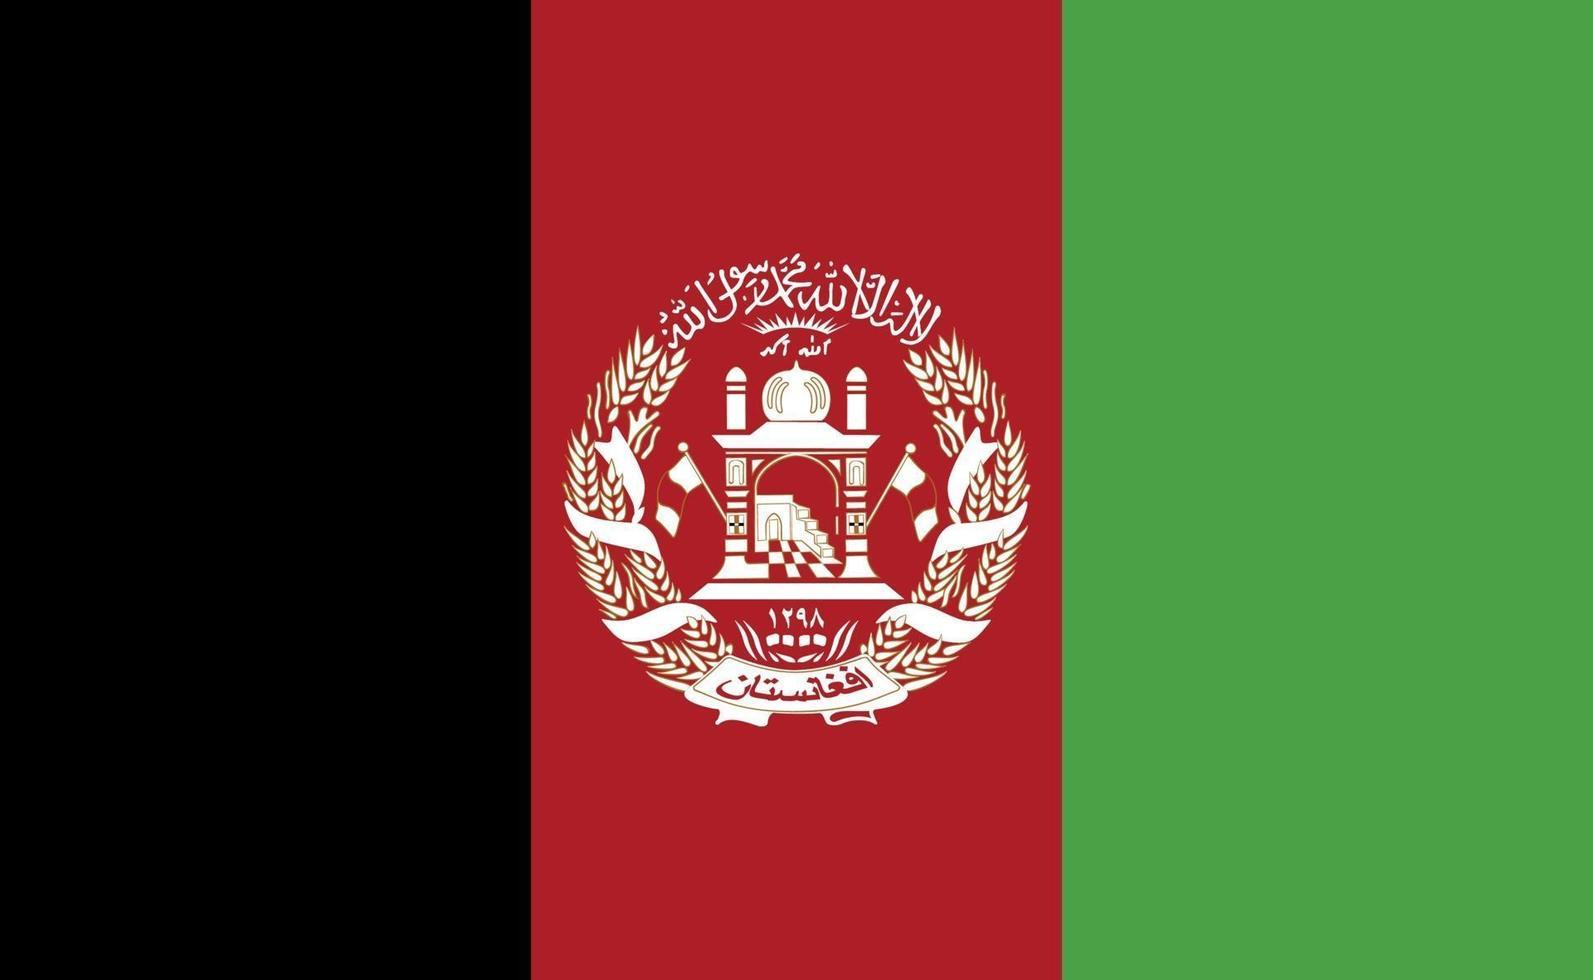 afghanistans nationella flagga i exakta proportioner - vektorillustration vektor